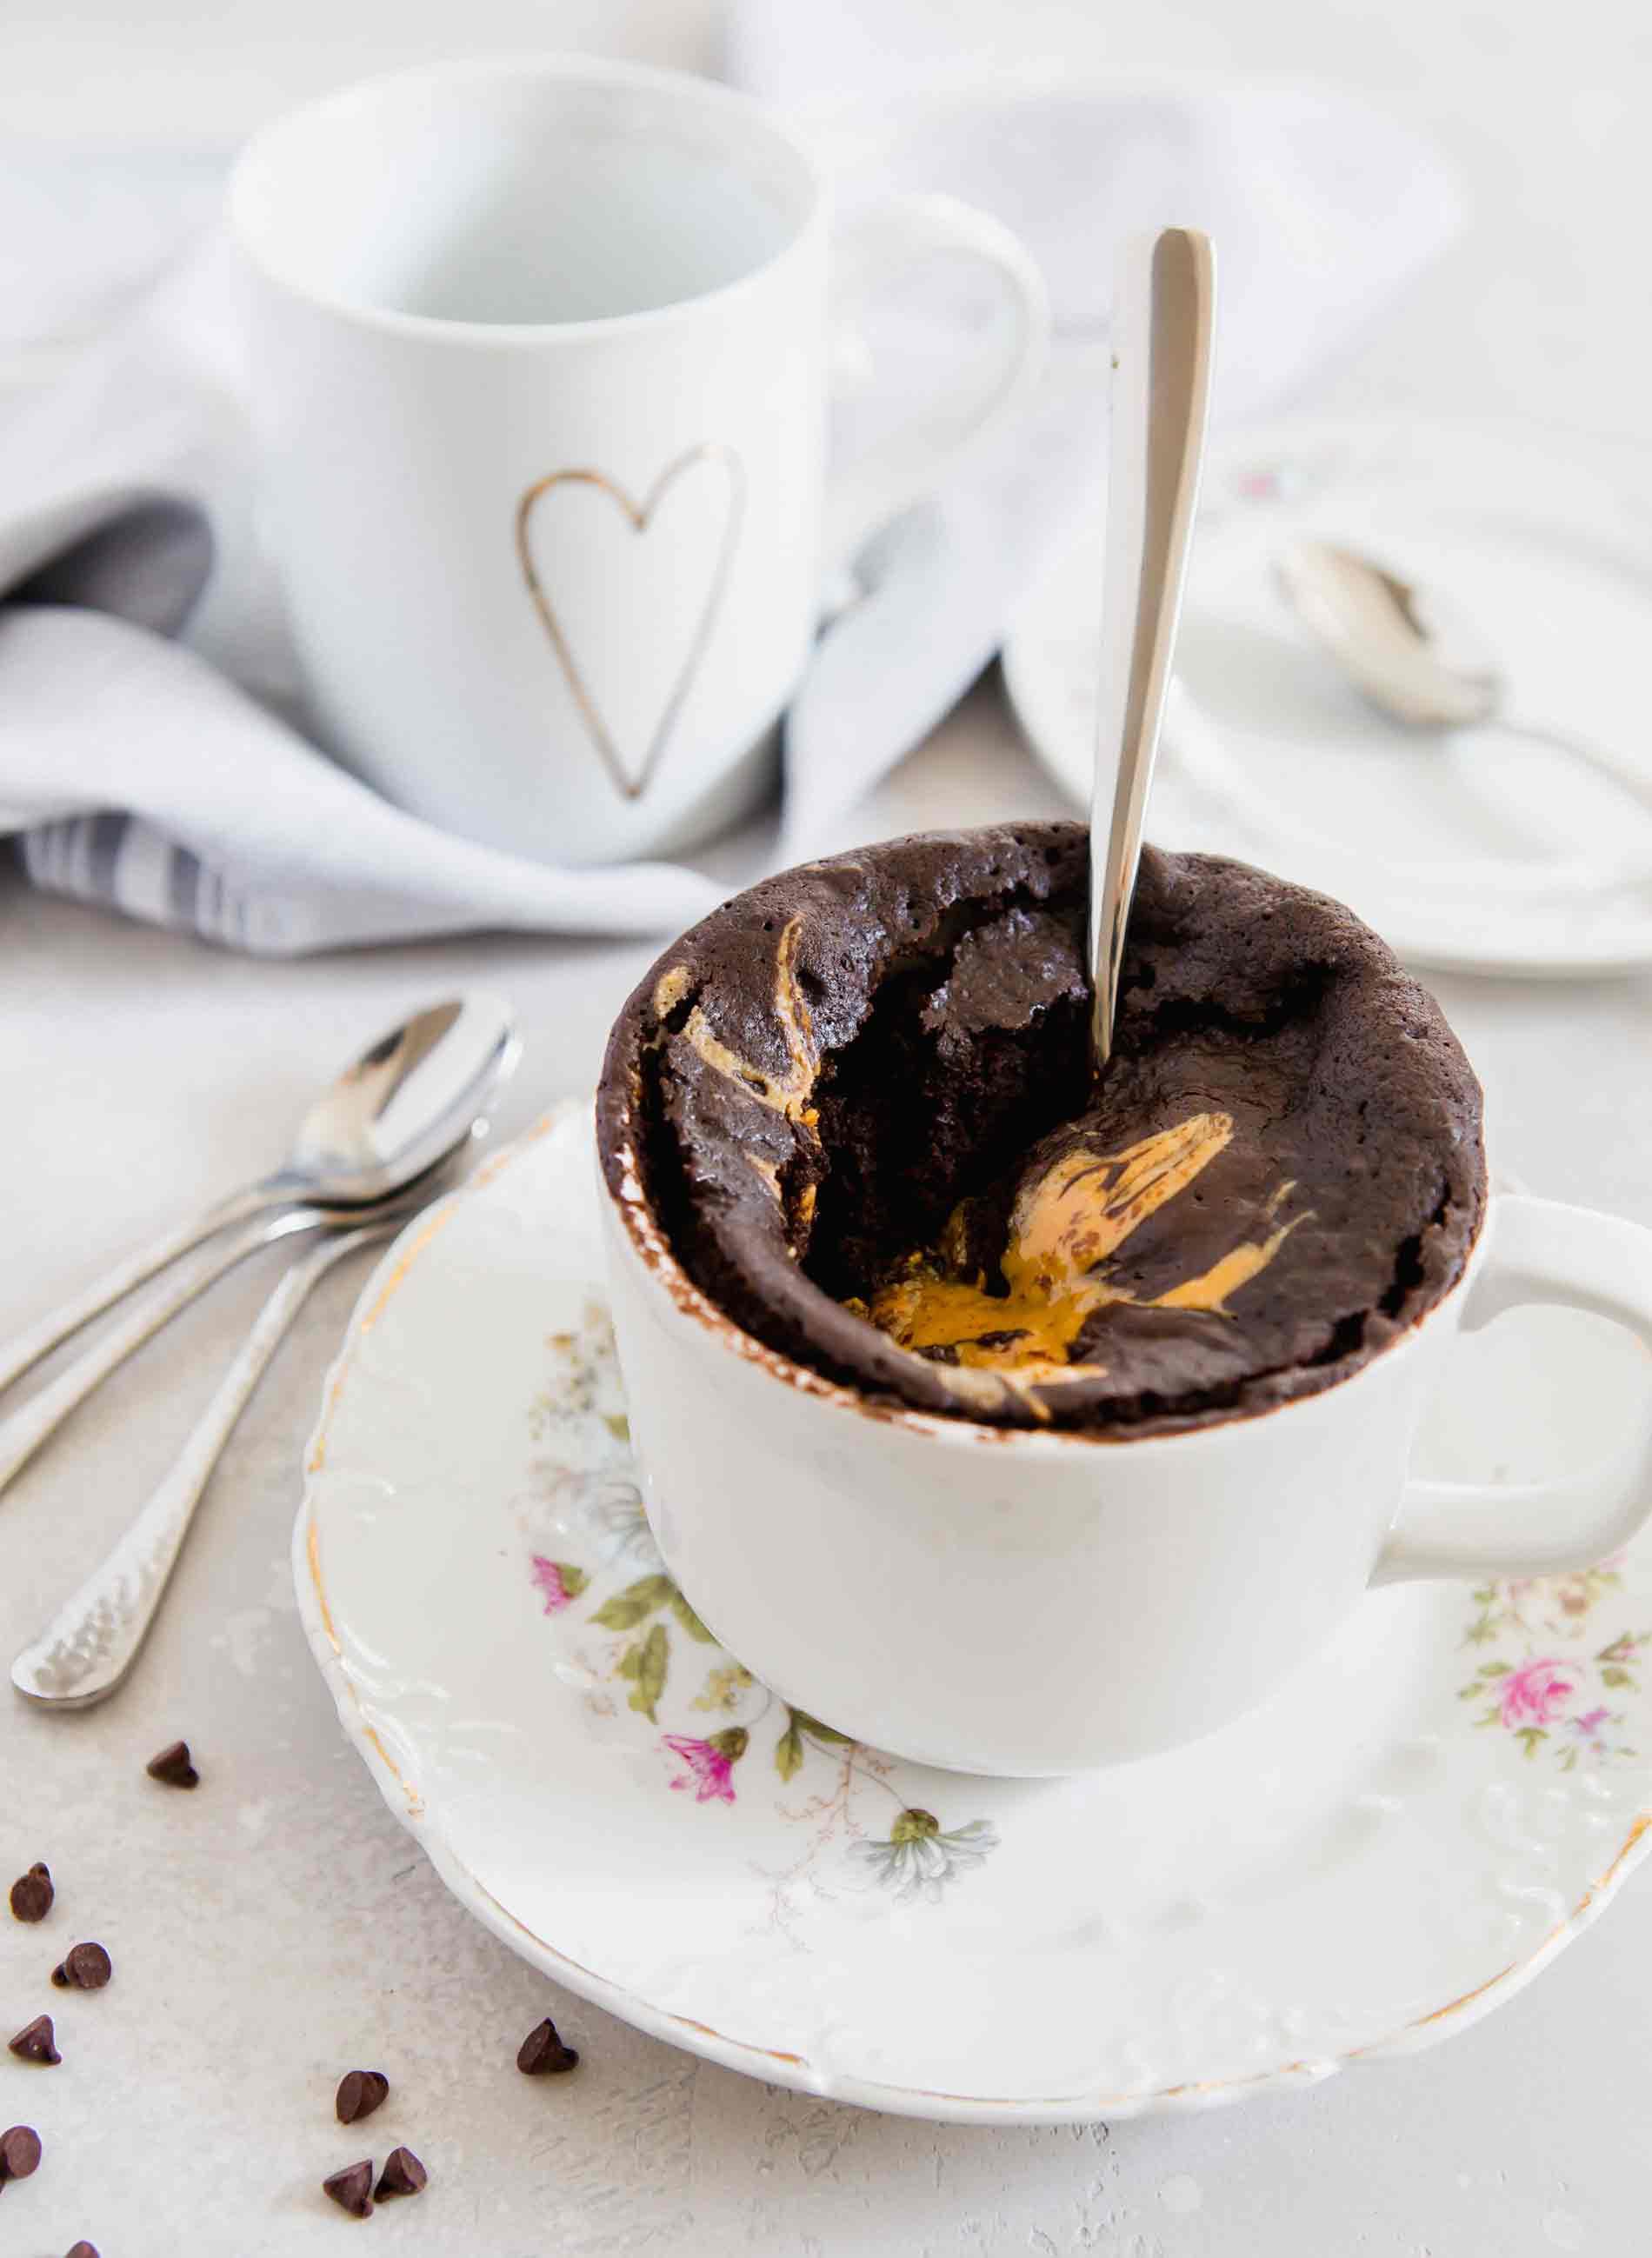 Peanut Butter Chocolate Mug Cake Egg Free Peanut Butter Mug Cake